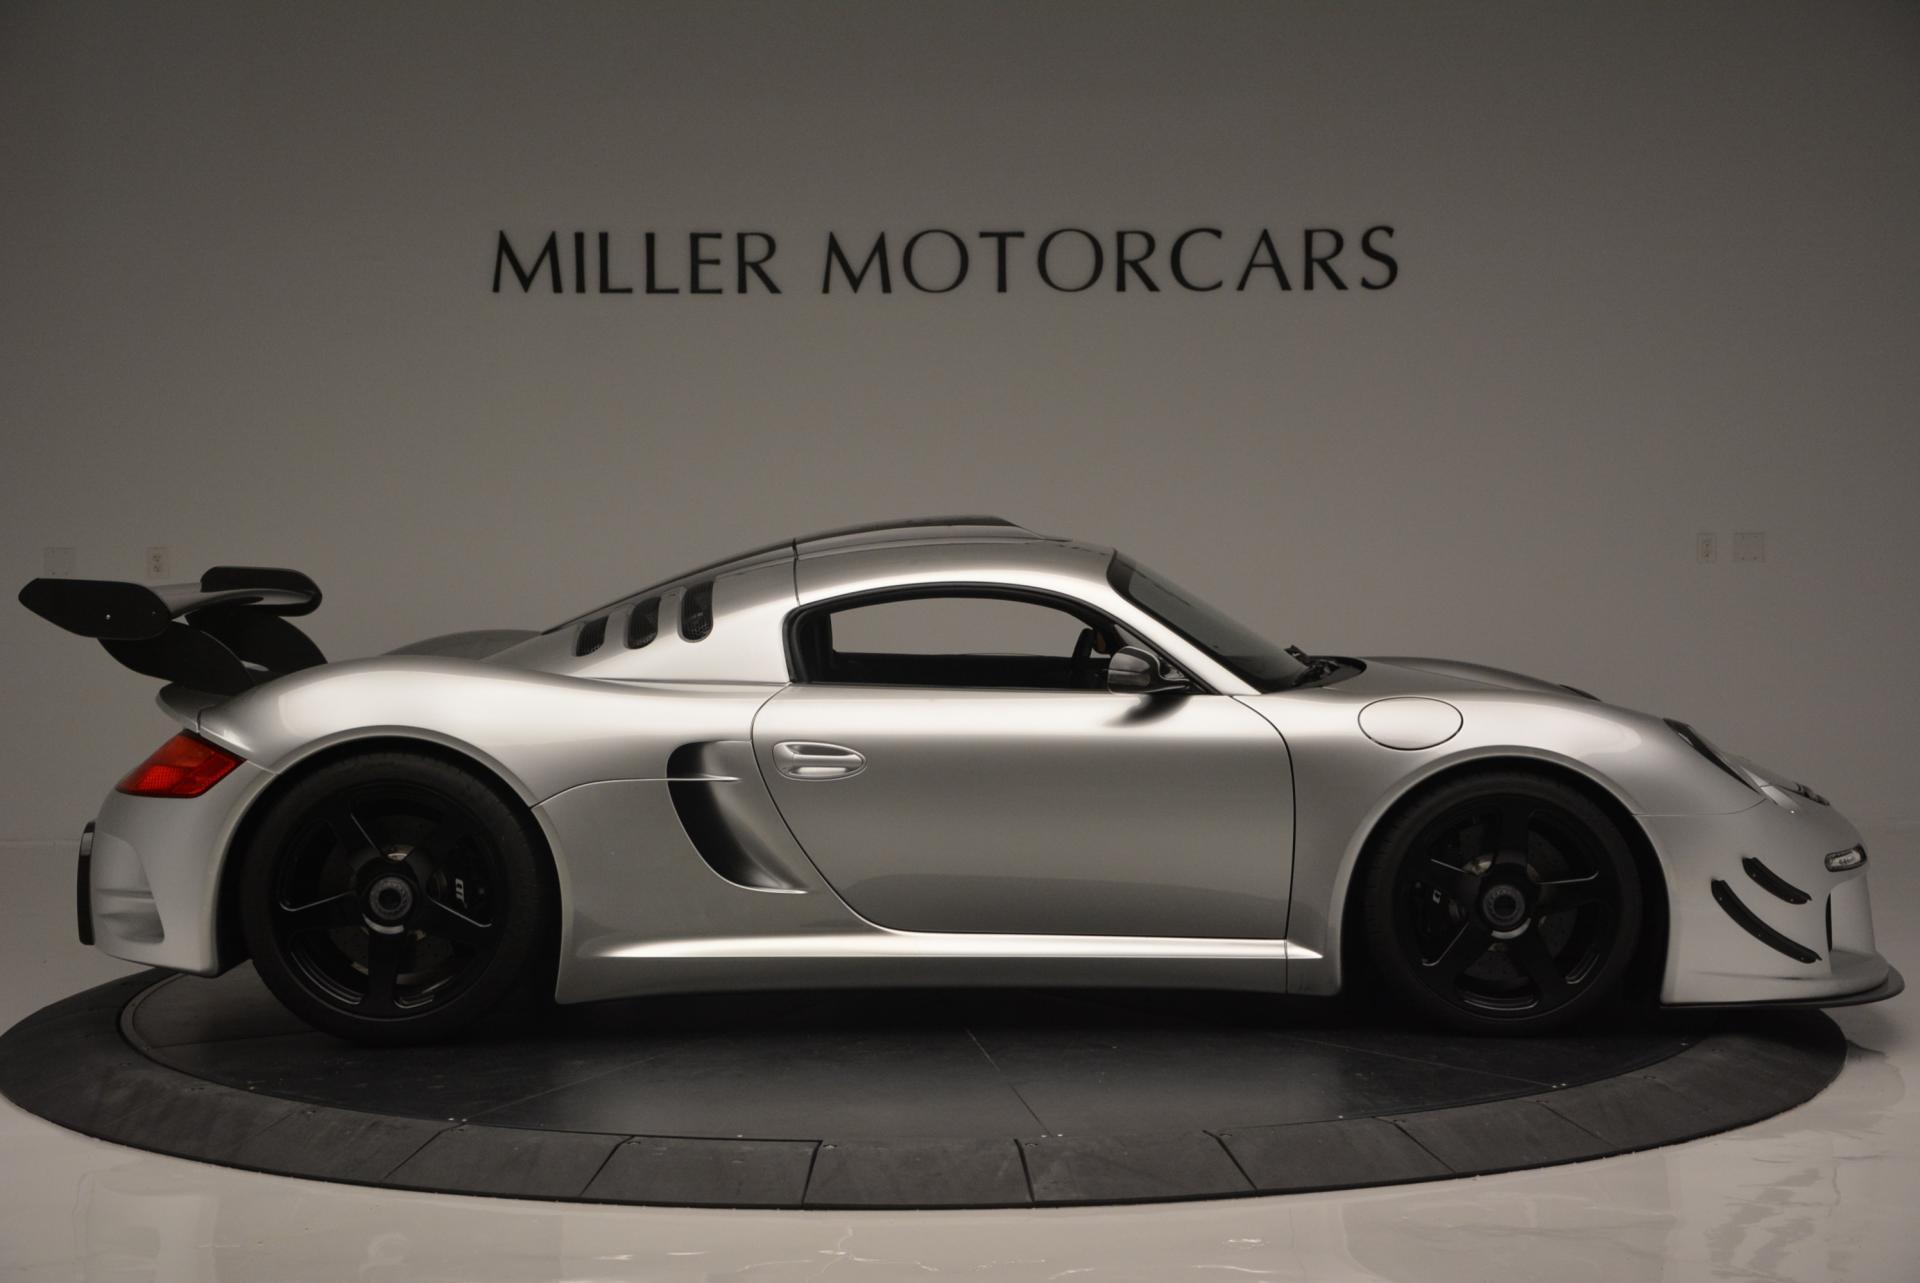 Used 2012 Porsche RUF CTR-3 Clubsport For Sale In Westport, CT 110_p7